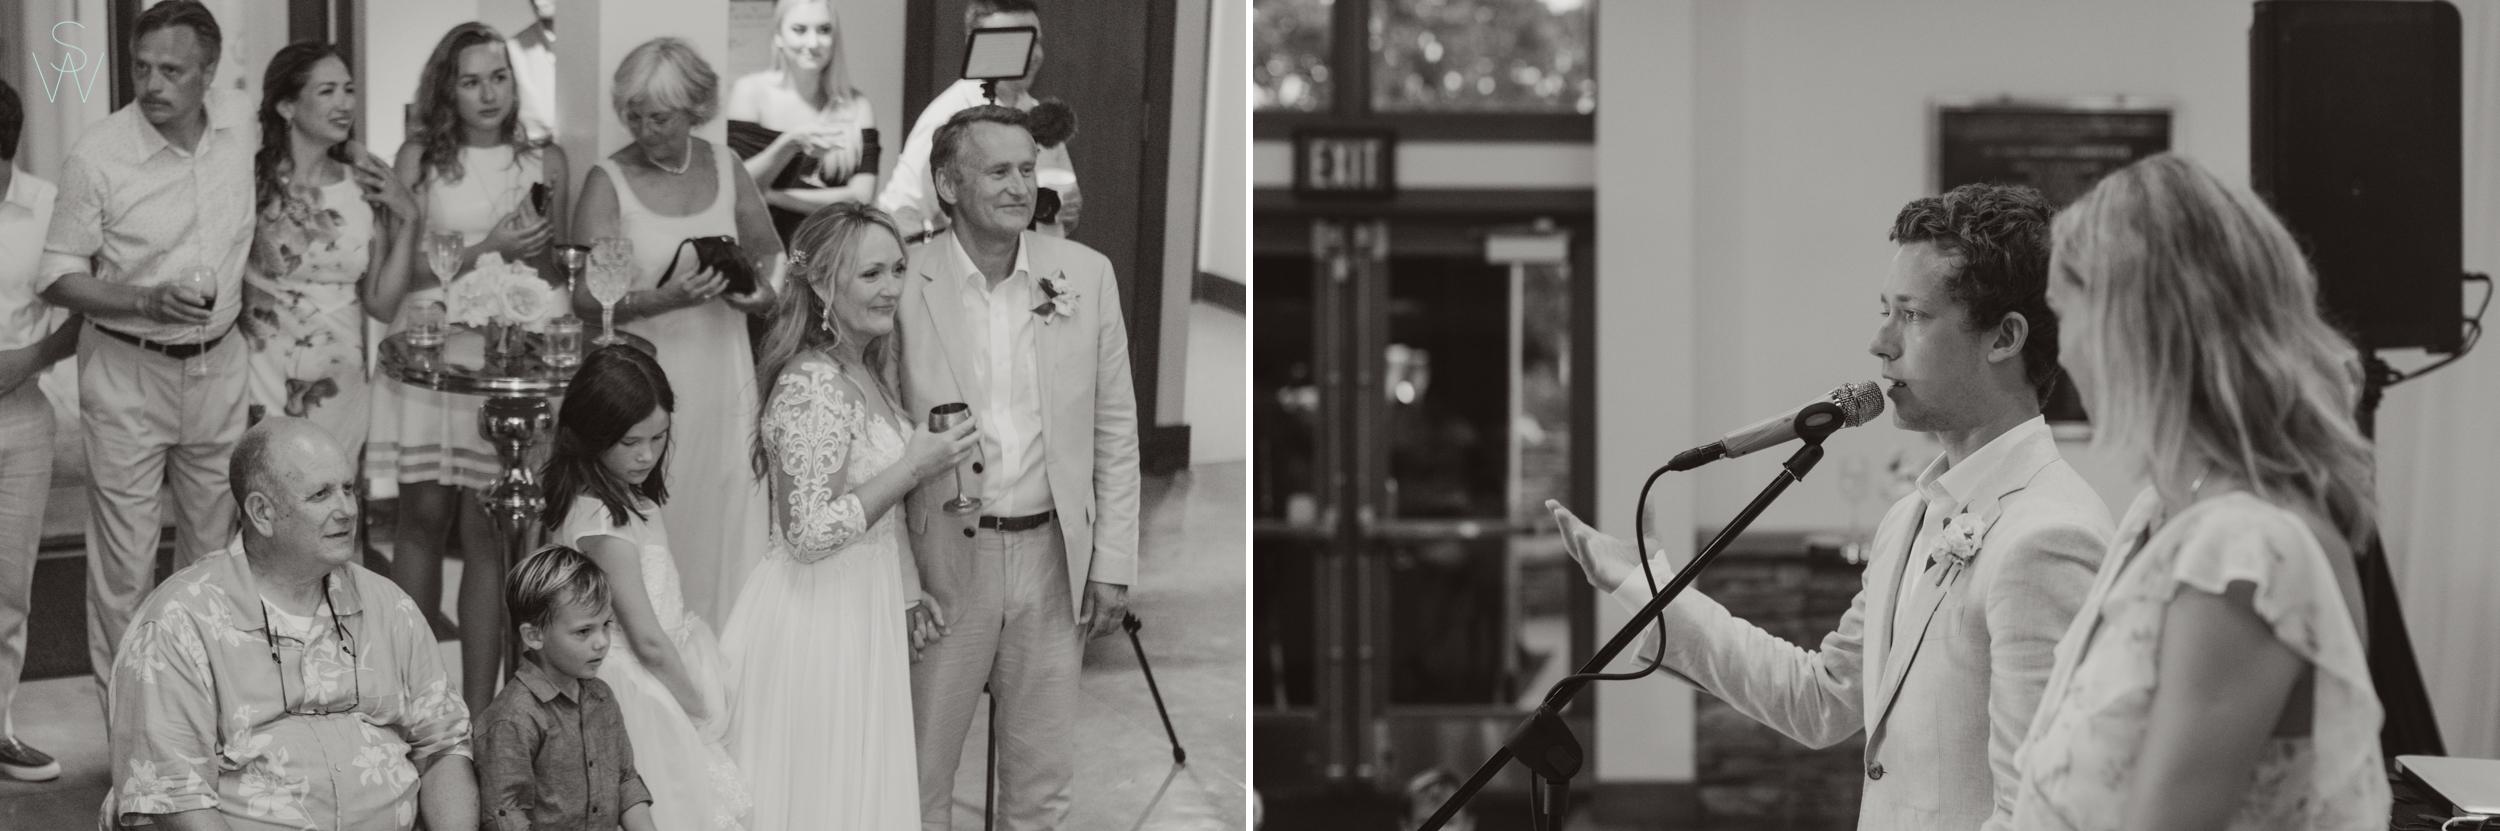 165DEL.MAR.WEDDINGS.livemusic.photography.shewanders.JPG